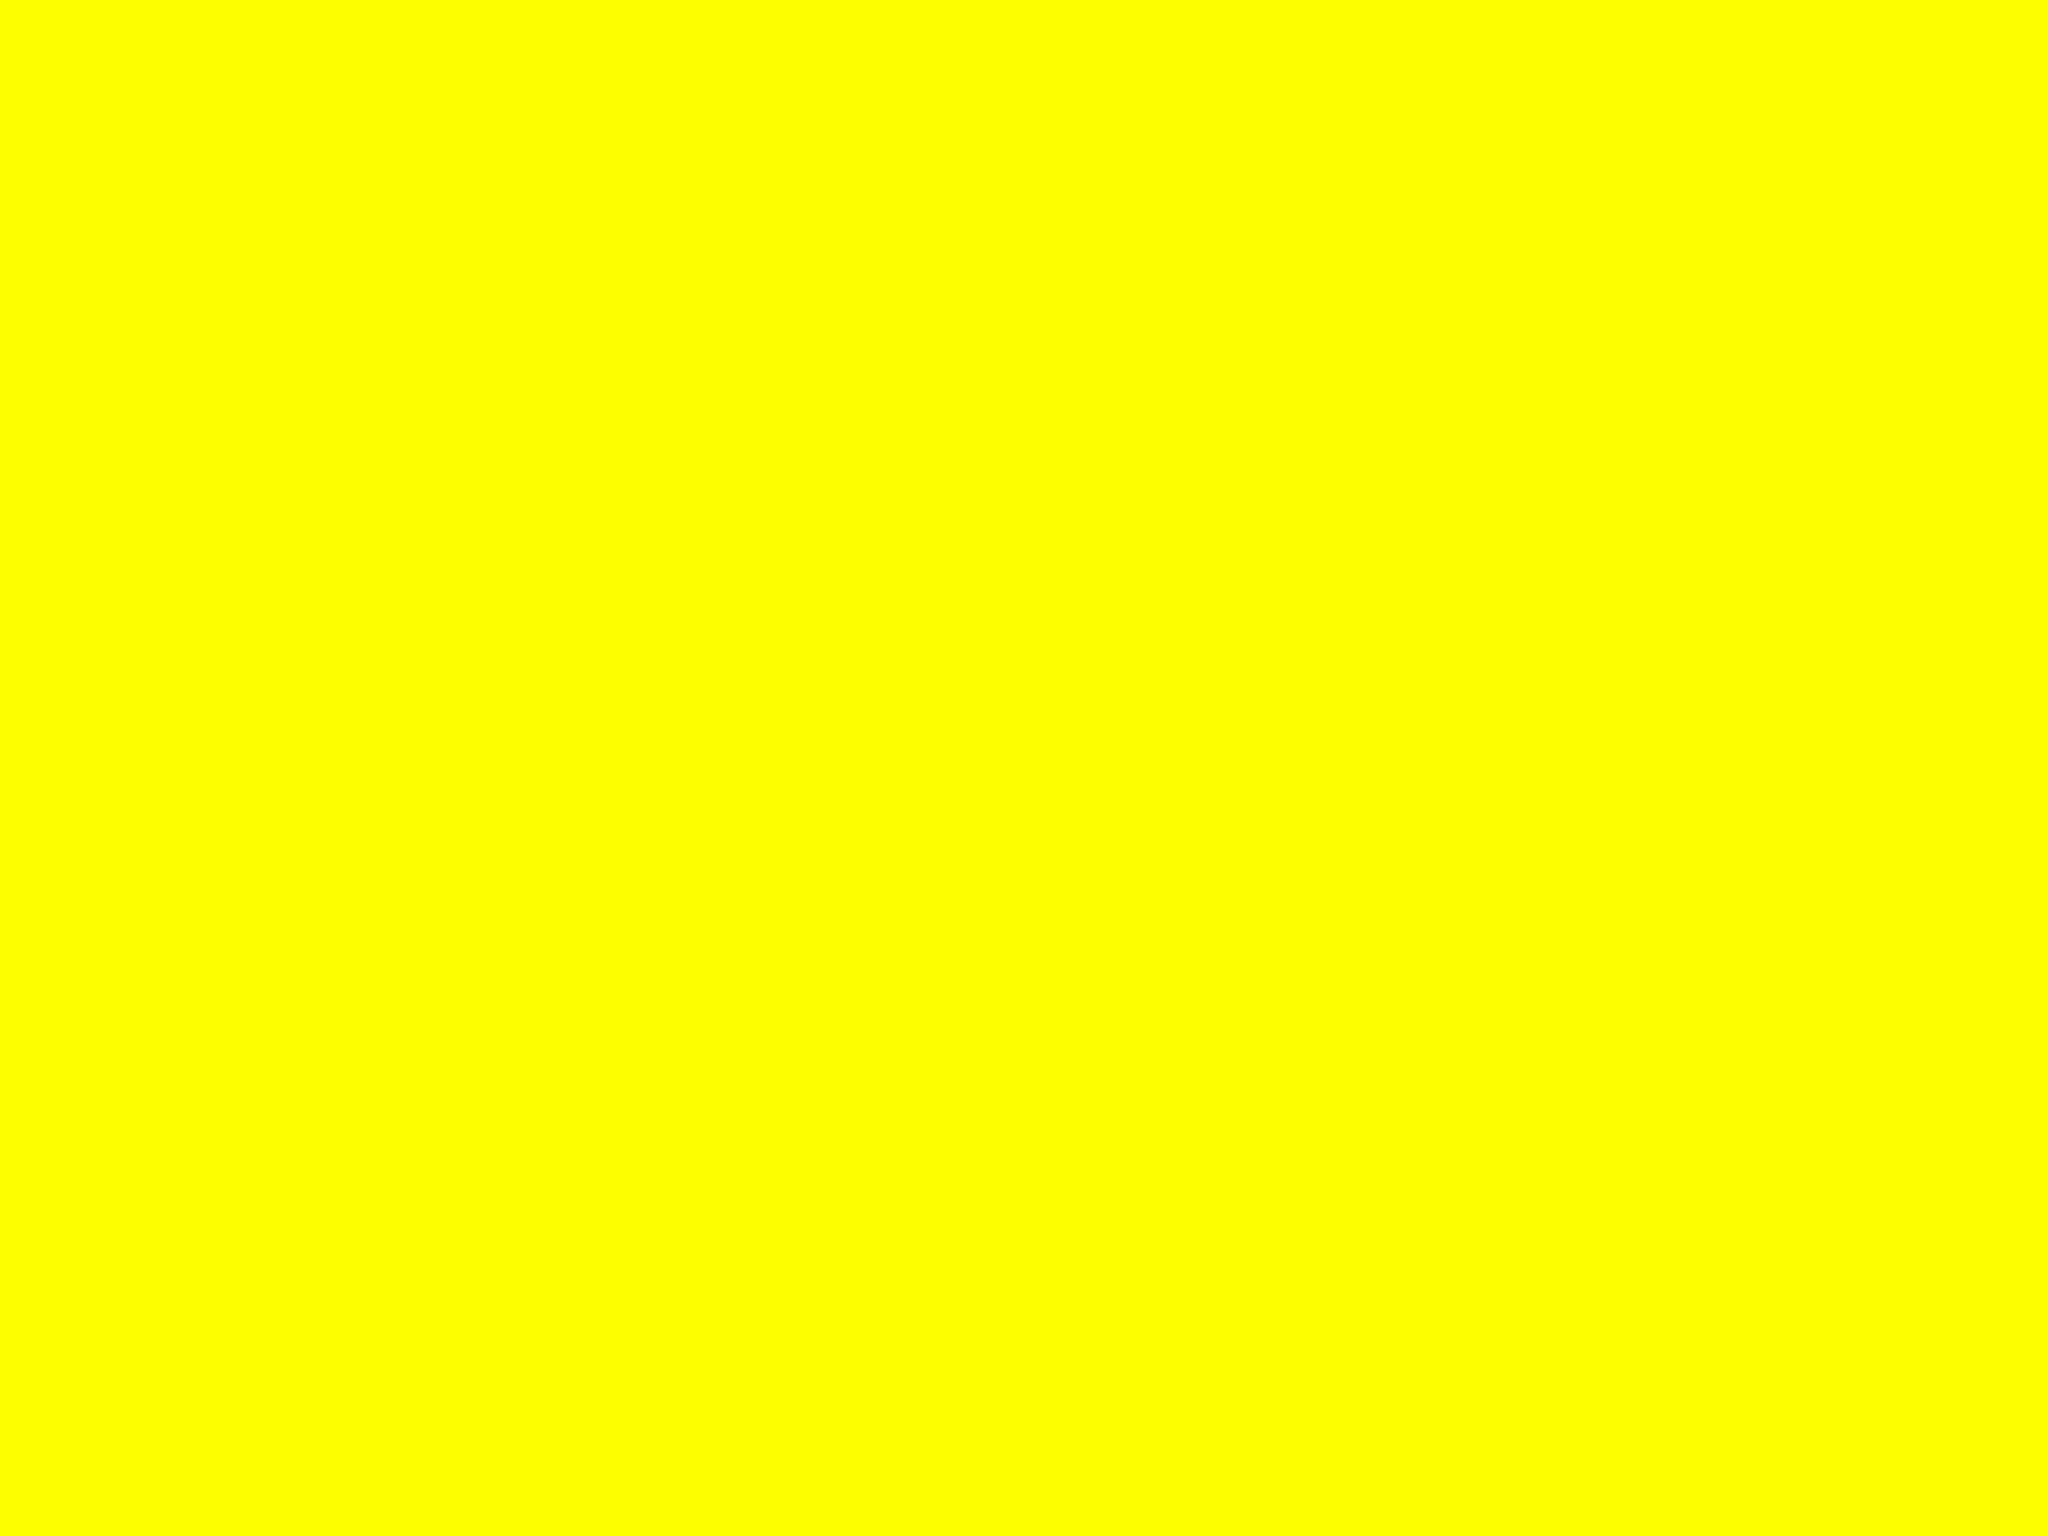 2048x1536 Lemon Glacier Solid Color Background